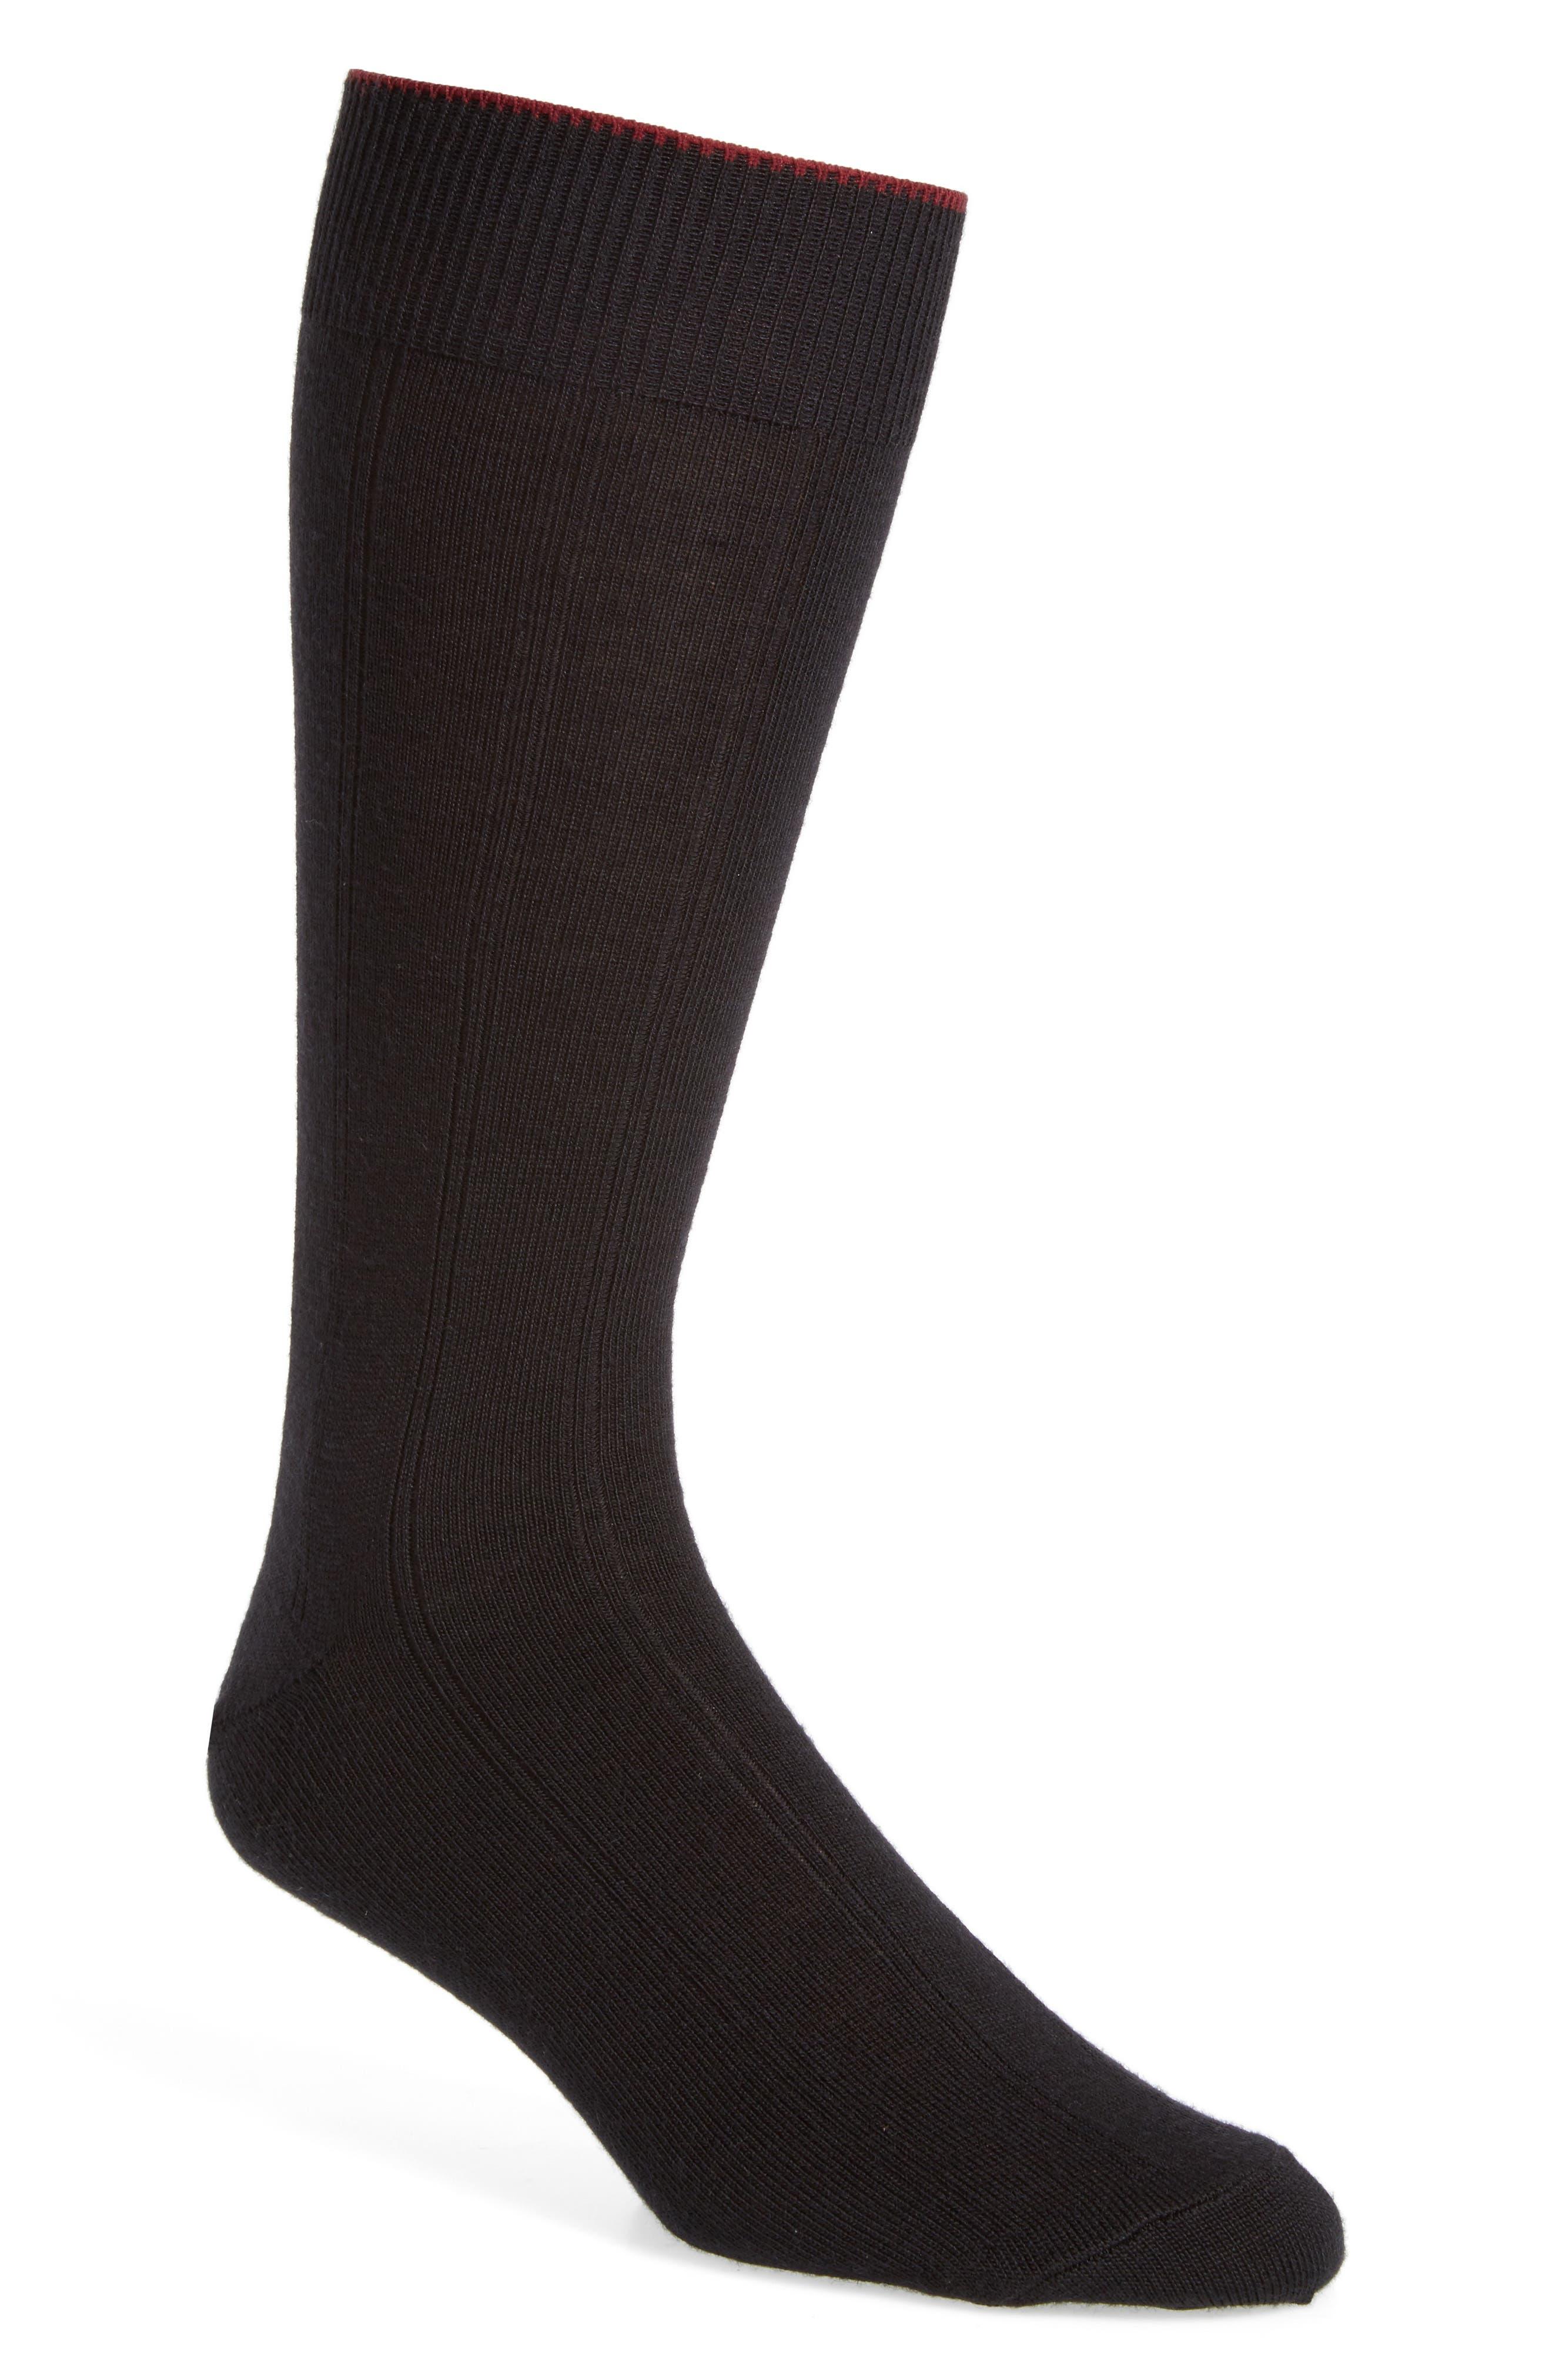 Alternate Image 1 Selected - Nordstrom Mens Shop Rib Wool Blend Socks (Men)